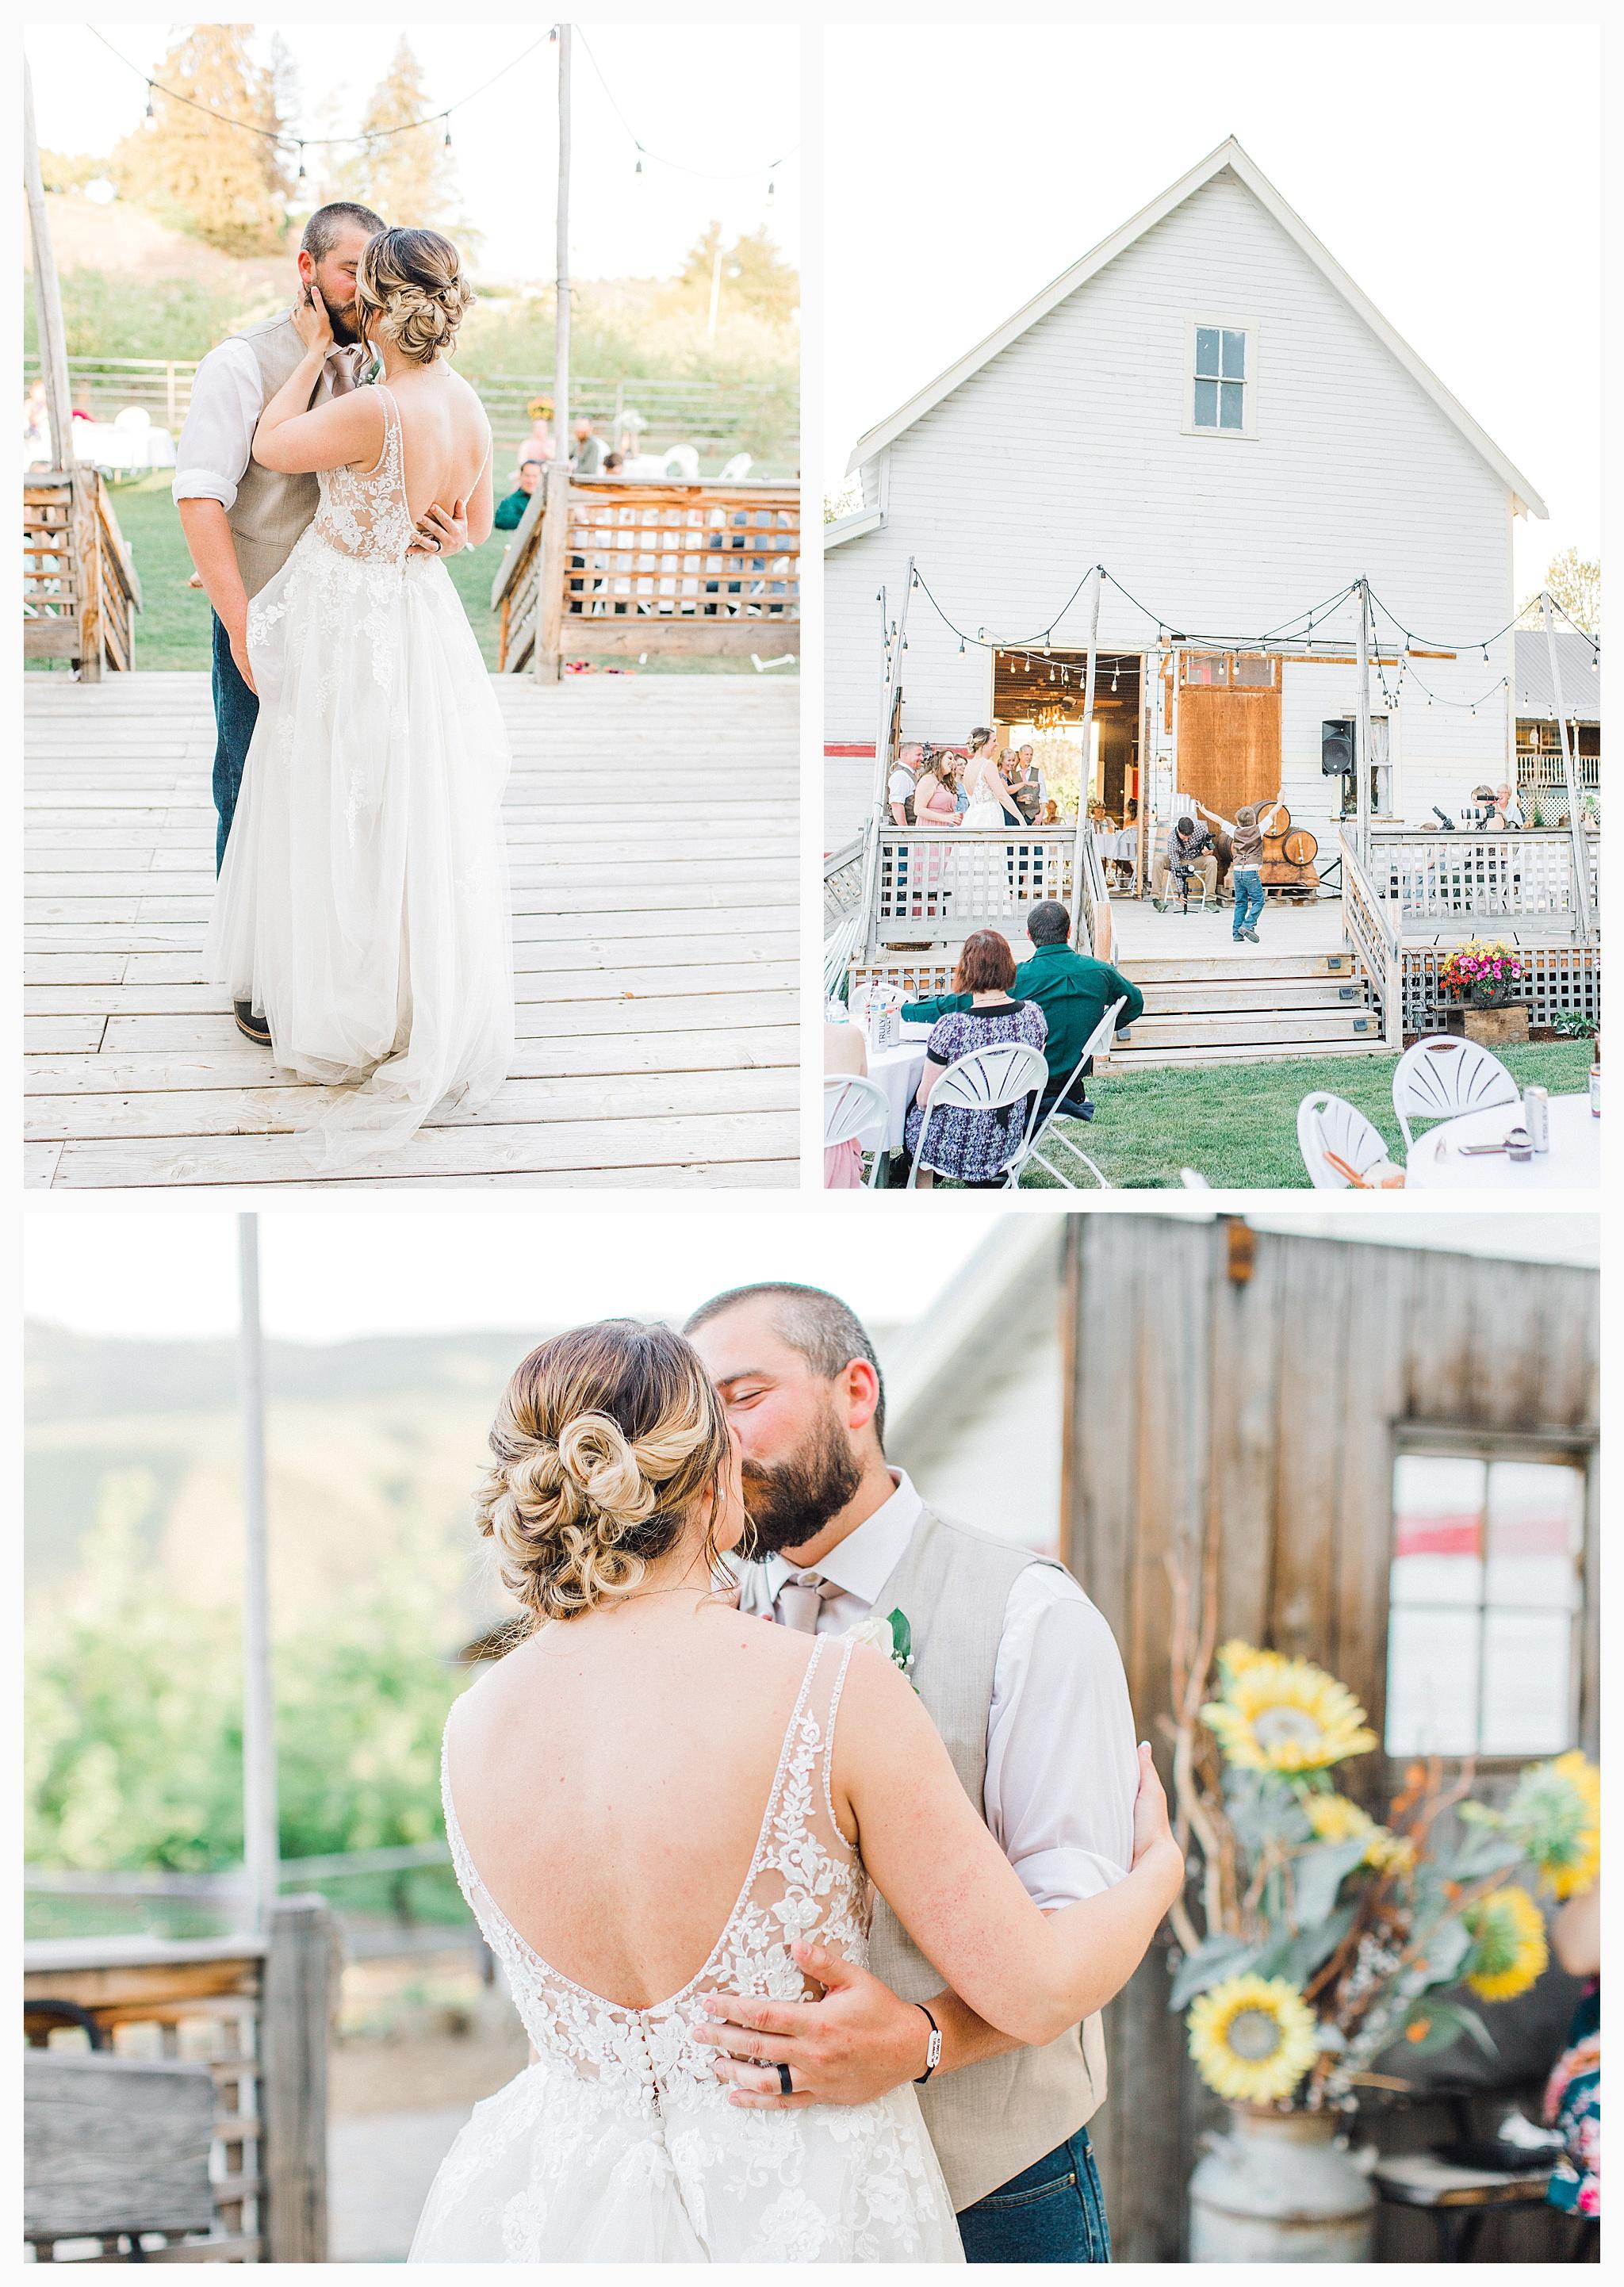 Rustic barn wedding in Wenatchee Washington at Sunshine Ranch on Easy Street, Emma Rose Company Seattle PNW Light and Airy Wedding Photographer_0109.jpg